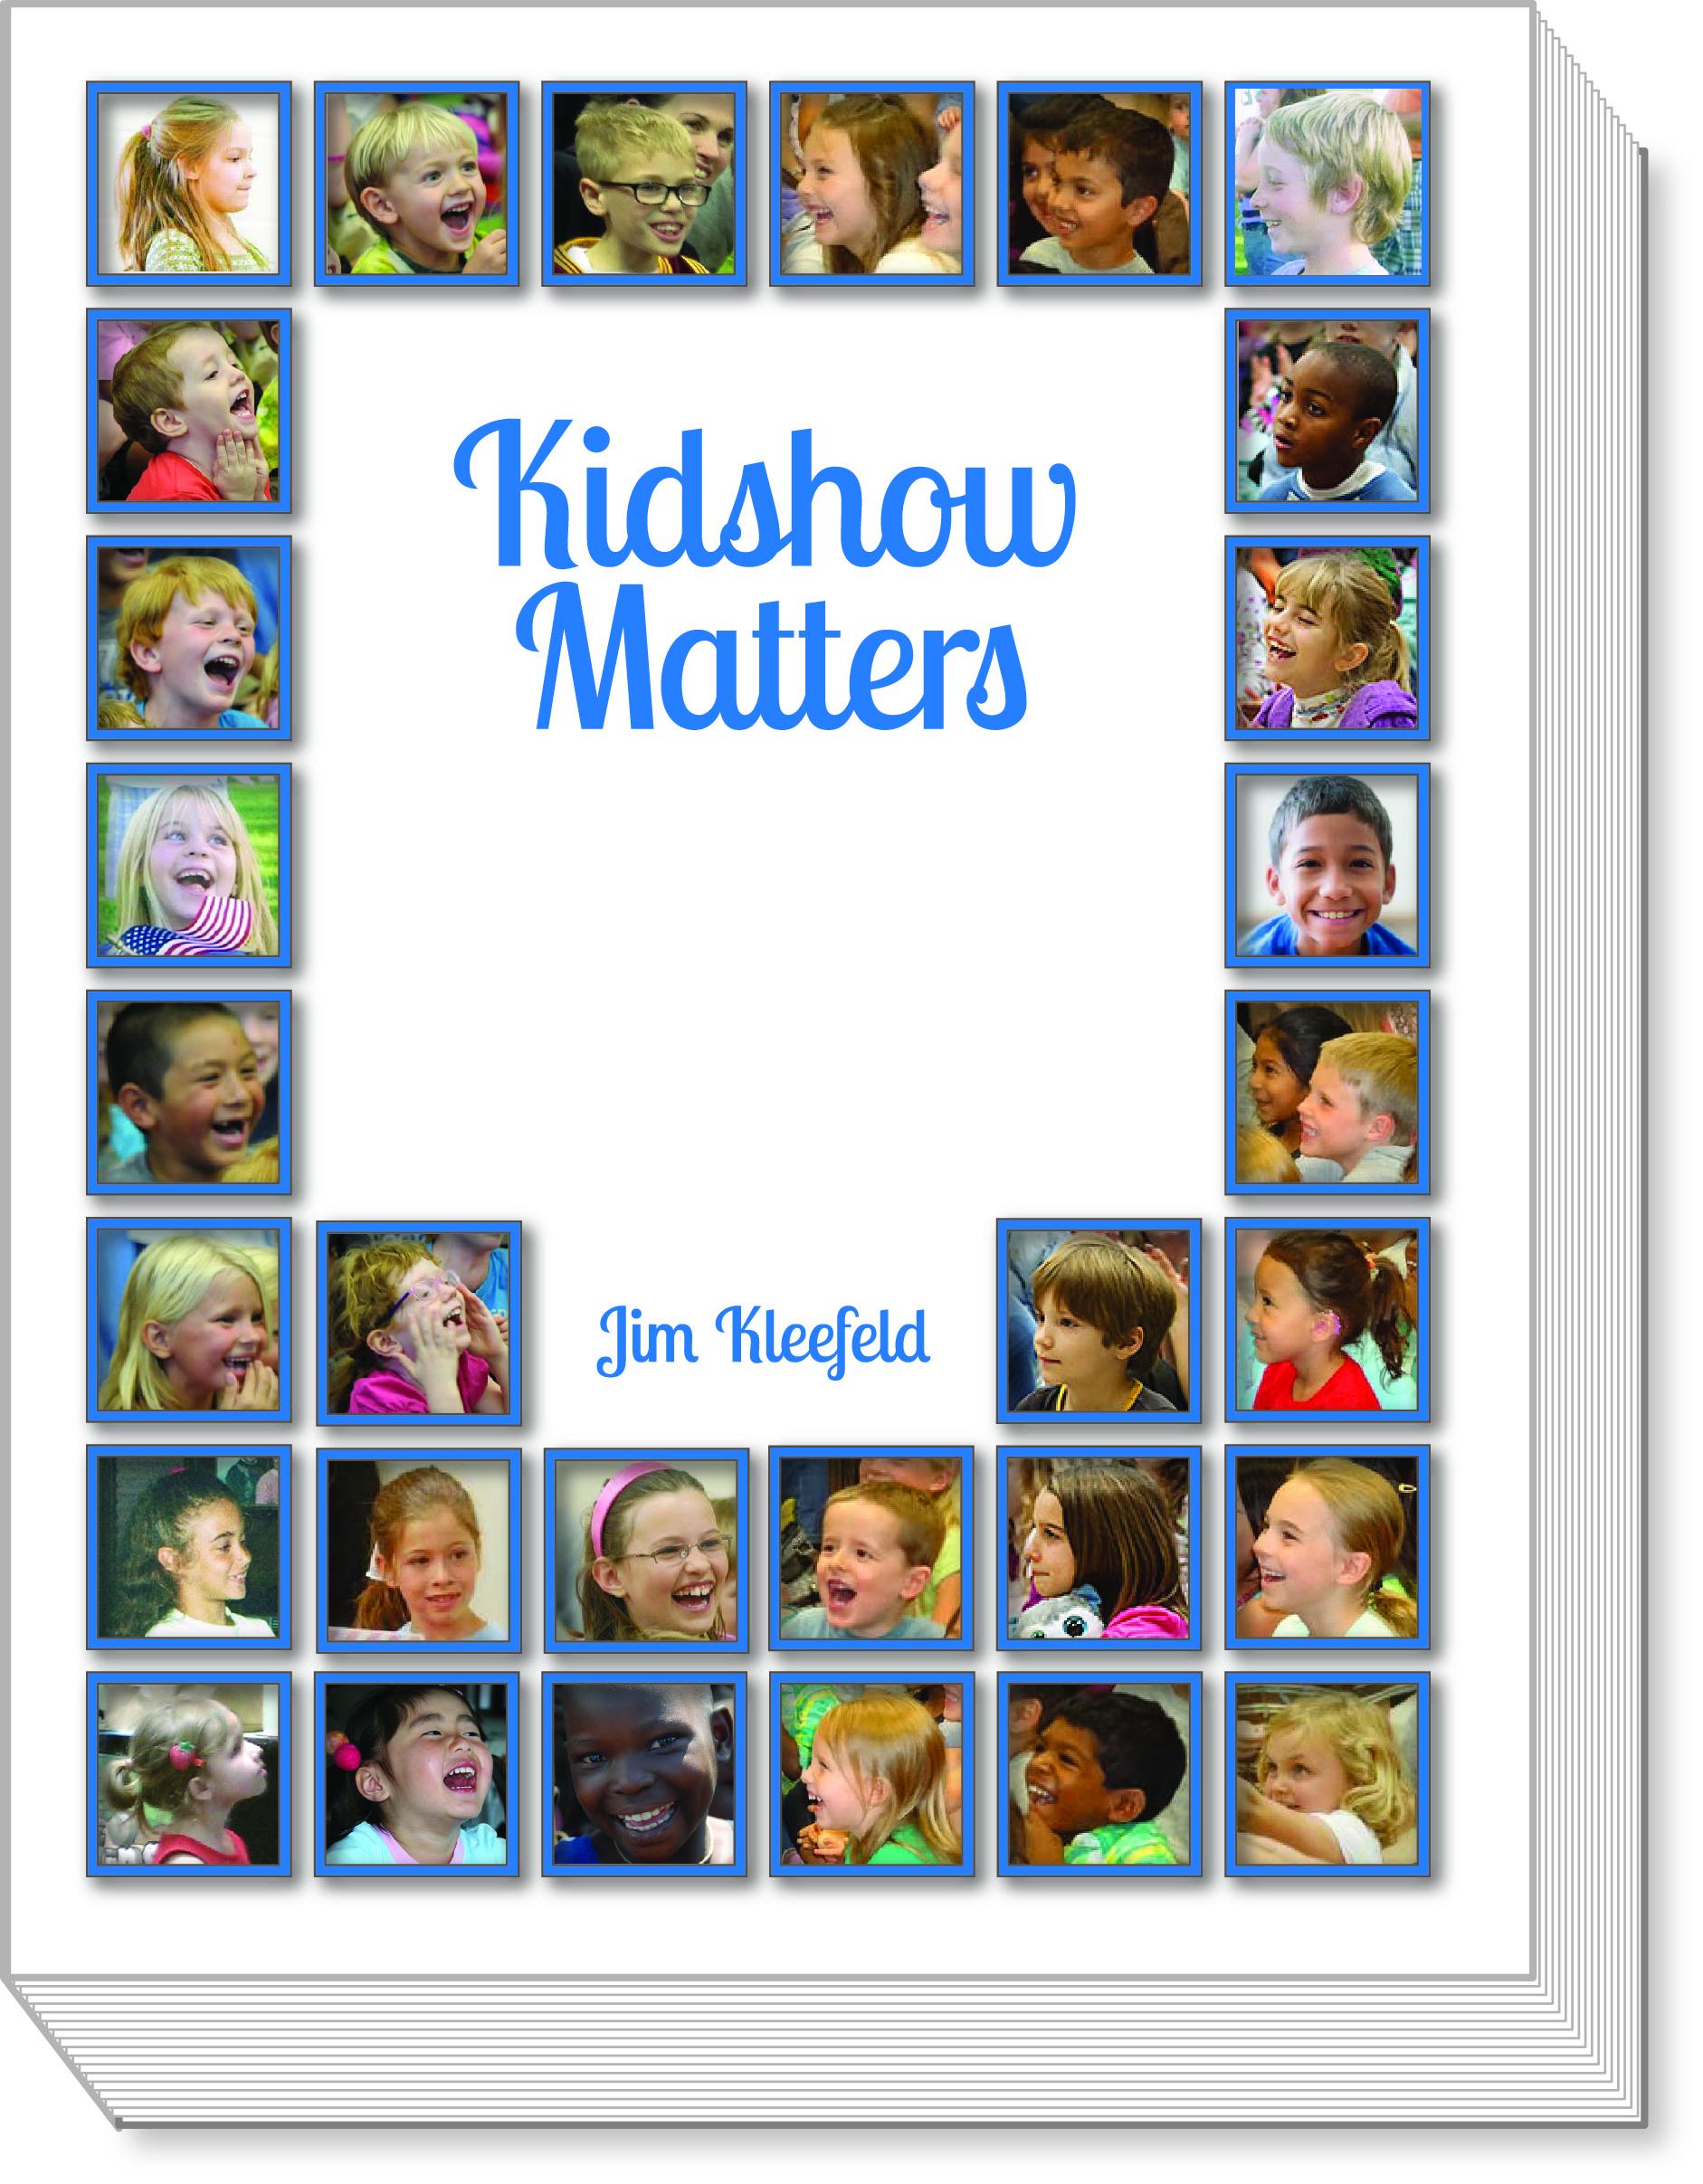 Kidshow Matters - magic